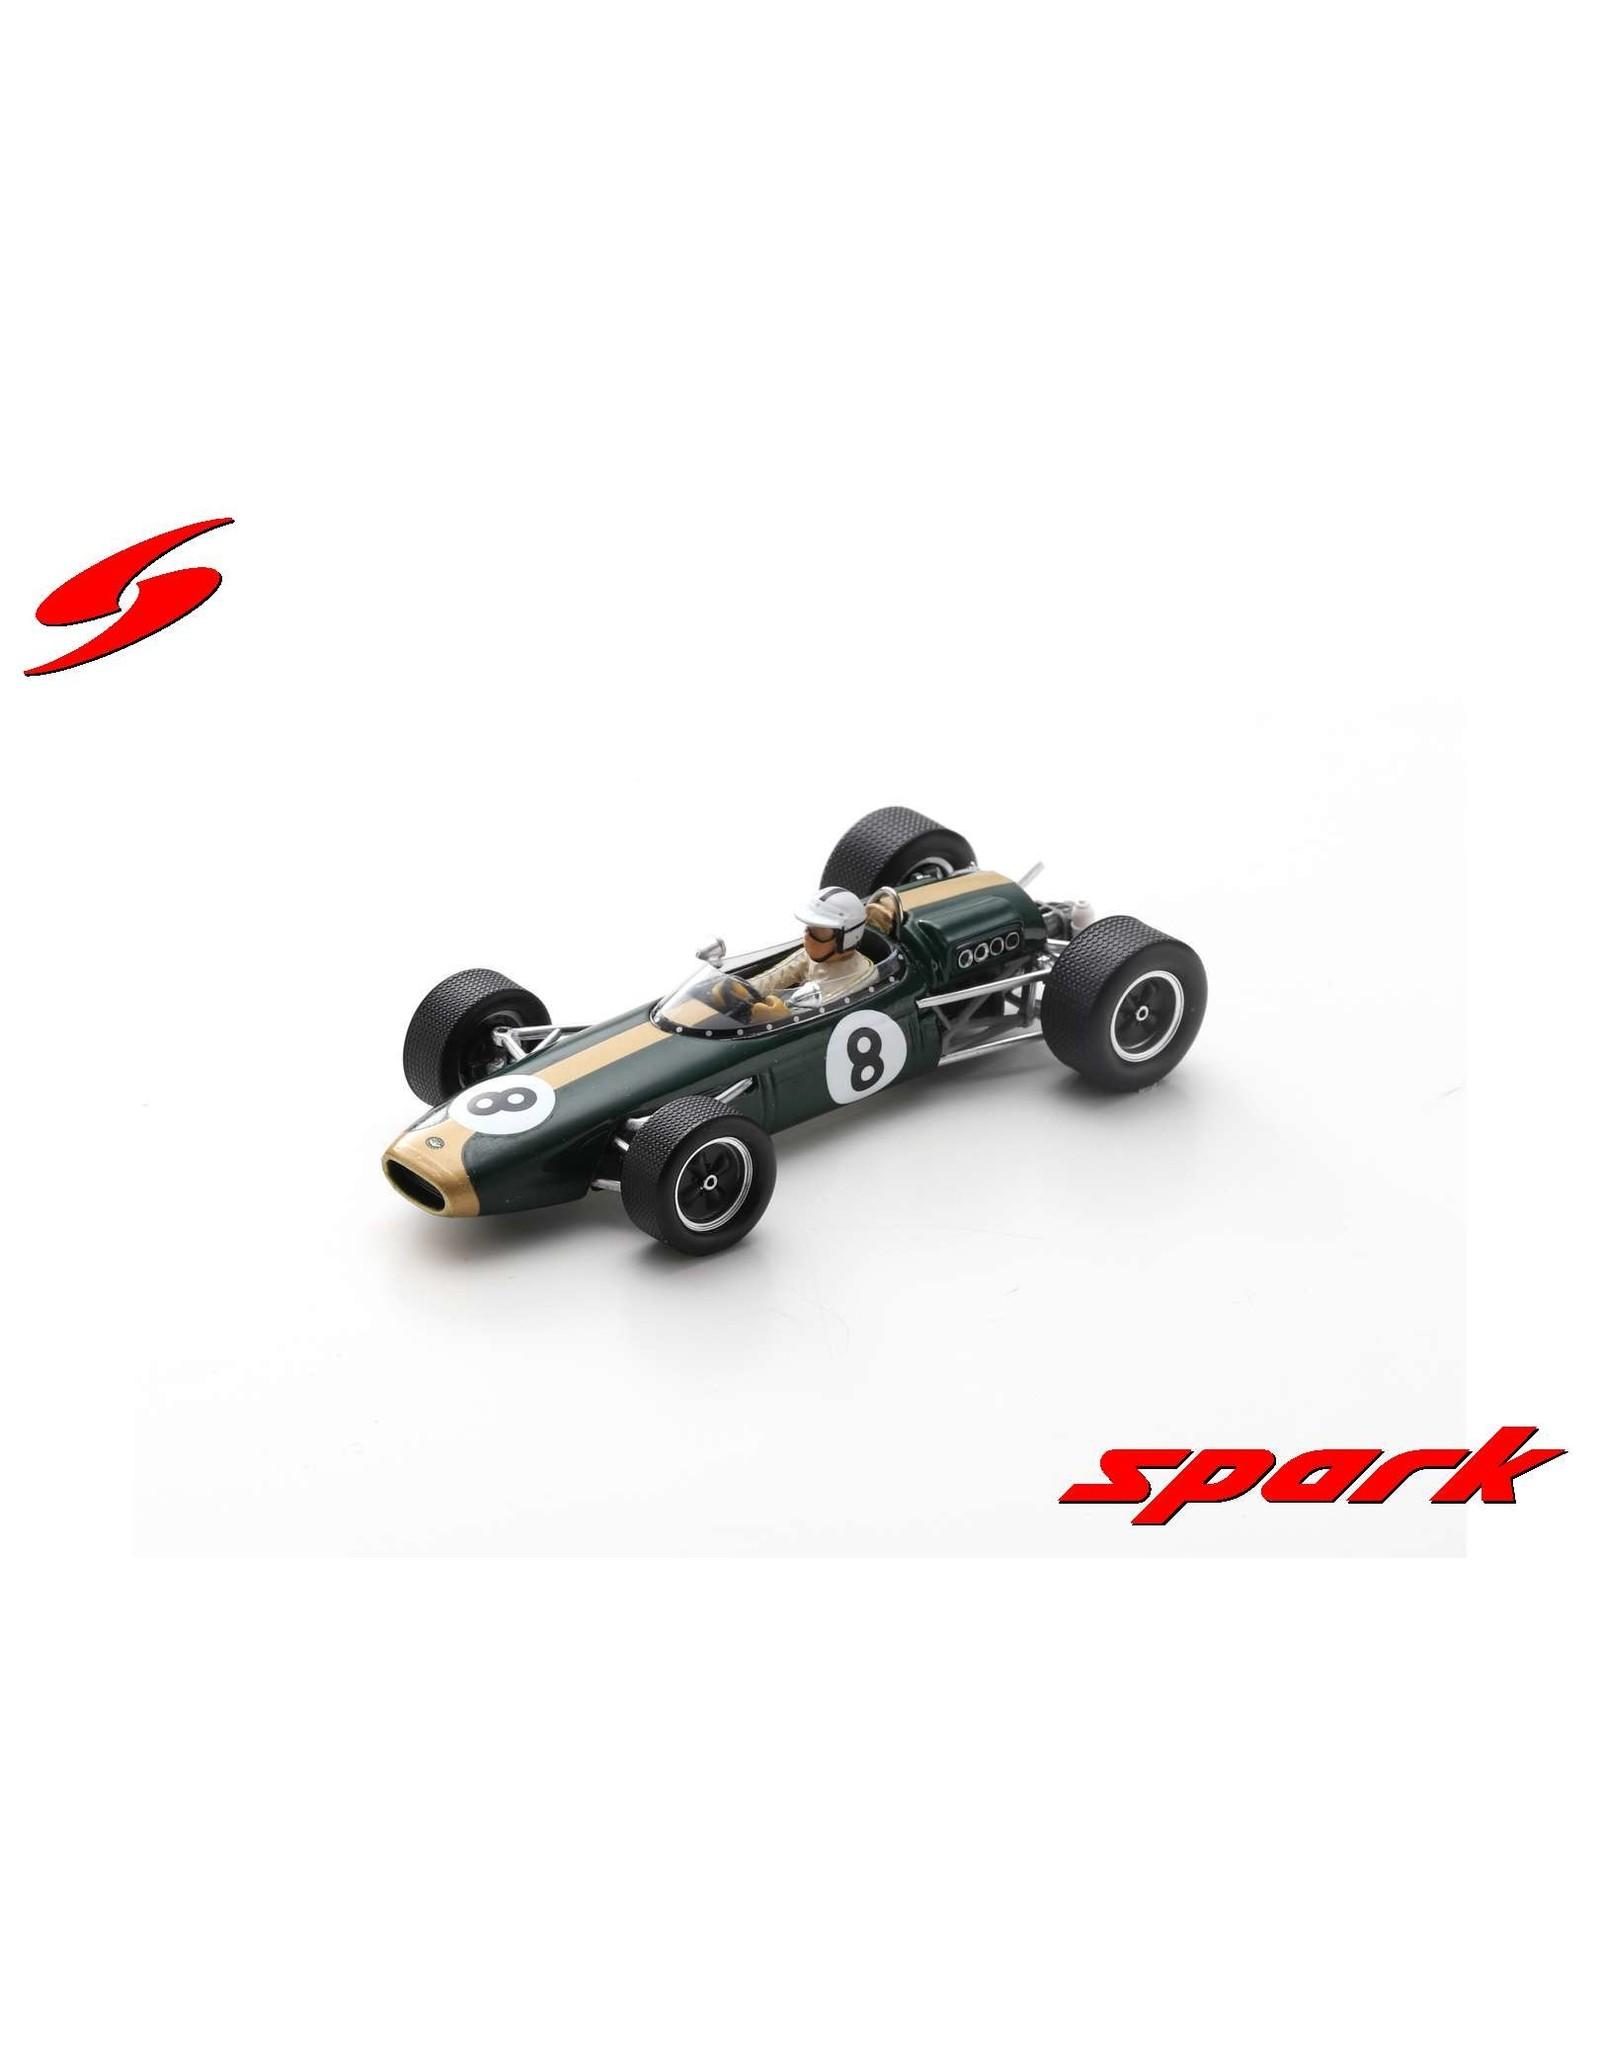 Formule 1 Formule 1 Brabham BT22 #8 GP Monaco 1966 - 1:43 - Spark